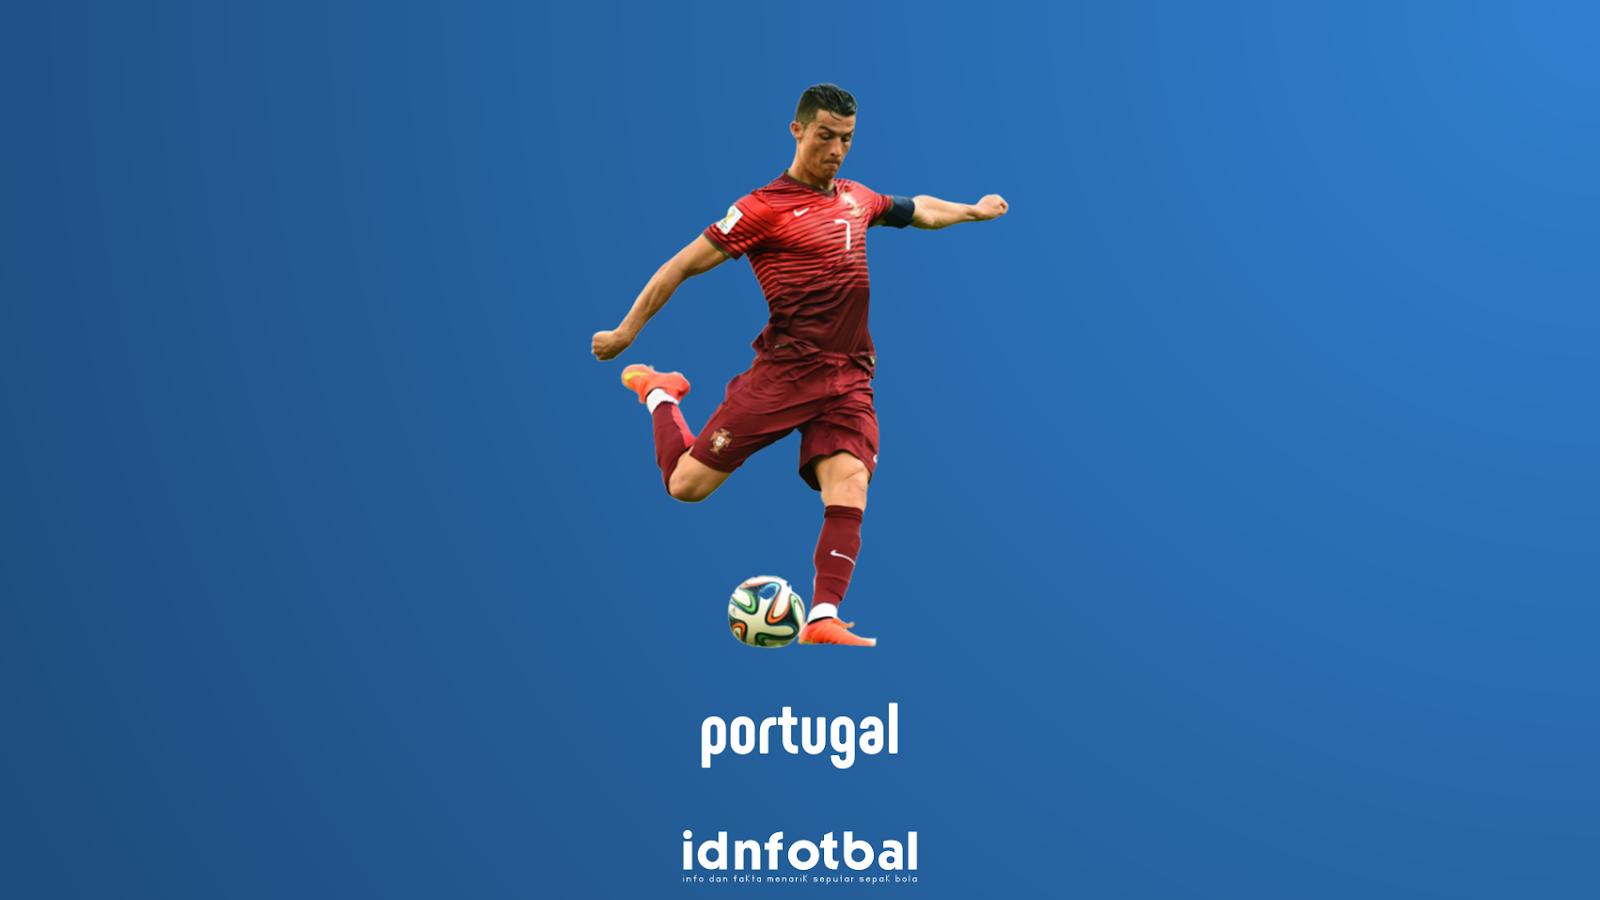 Cistiano Ronaldo dan Timnas Portugal